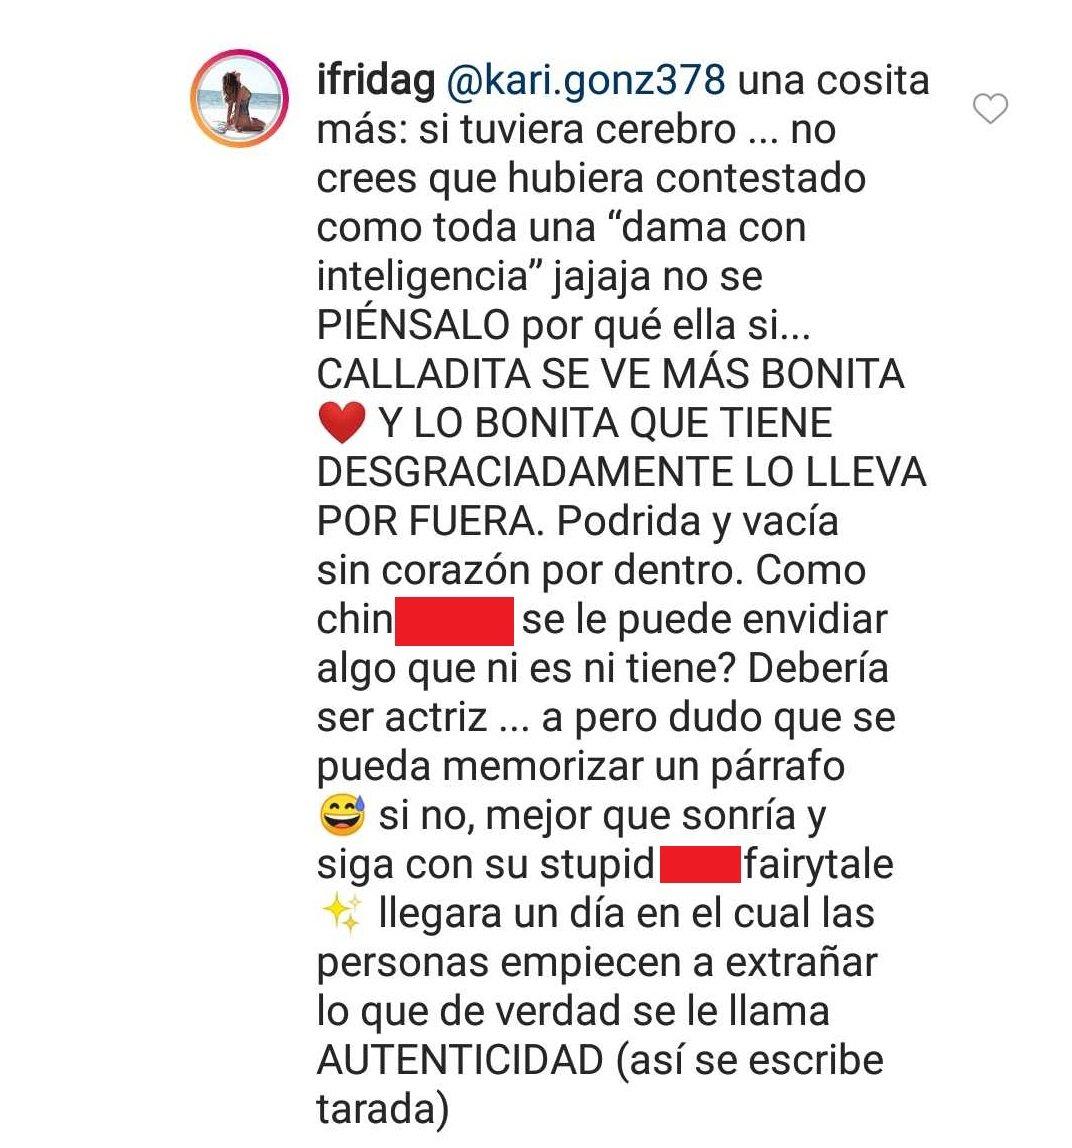 Comentario final de Frida.  | Imagen: Instagram/ Ifrida